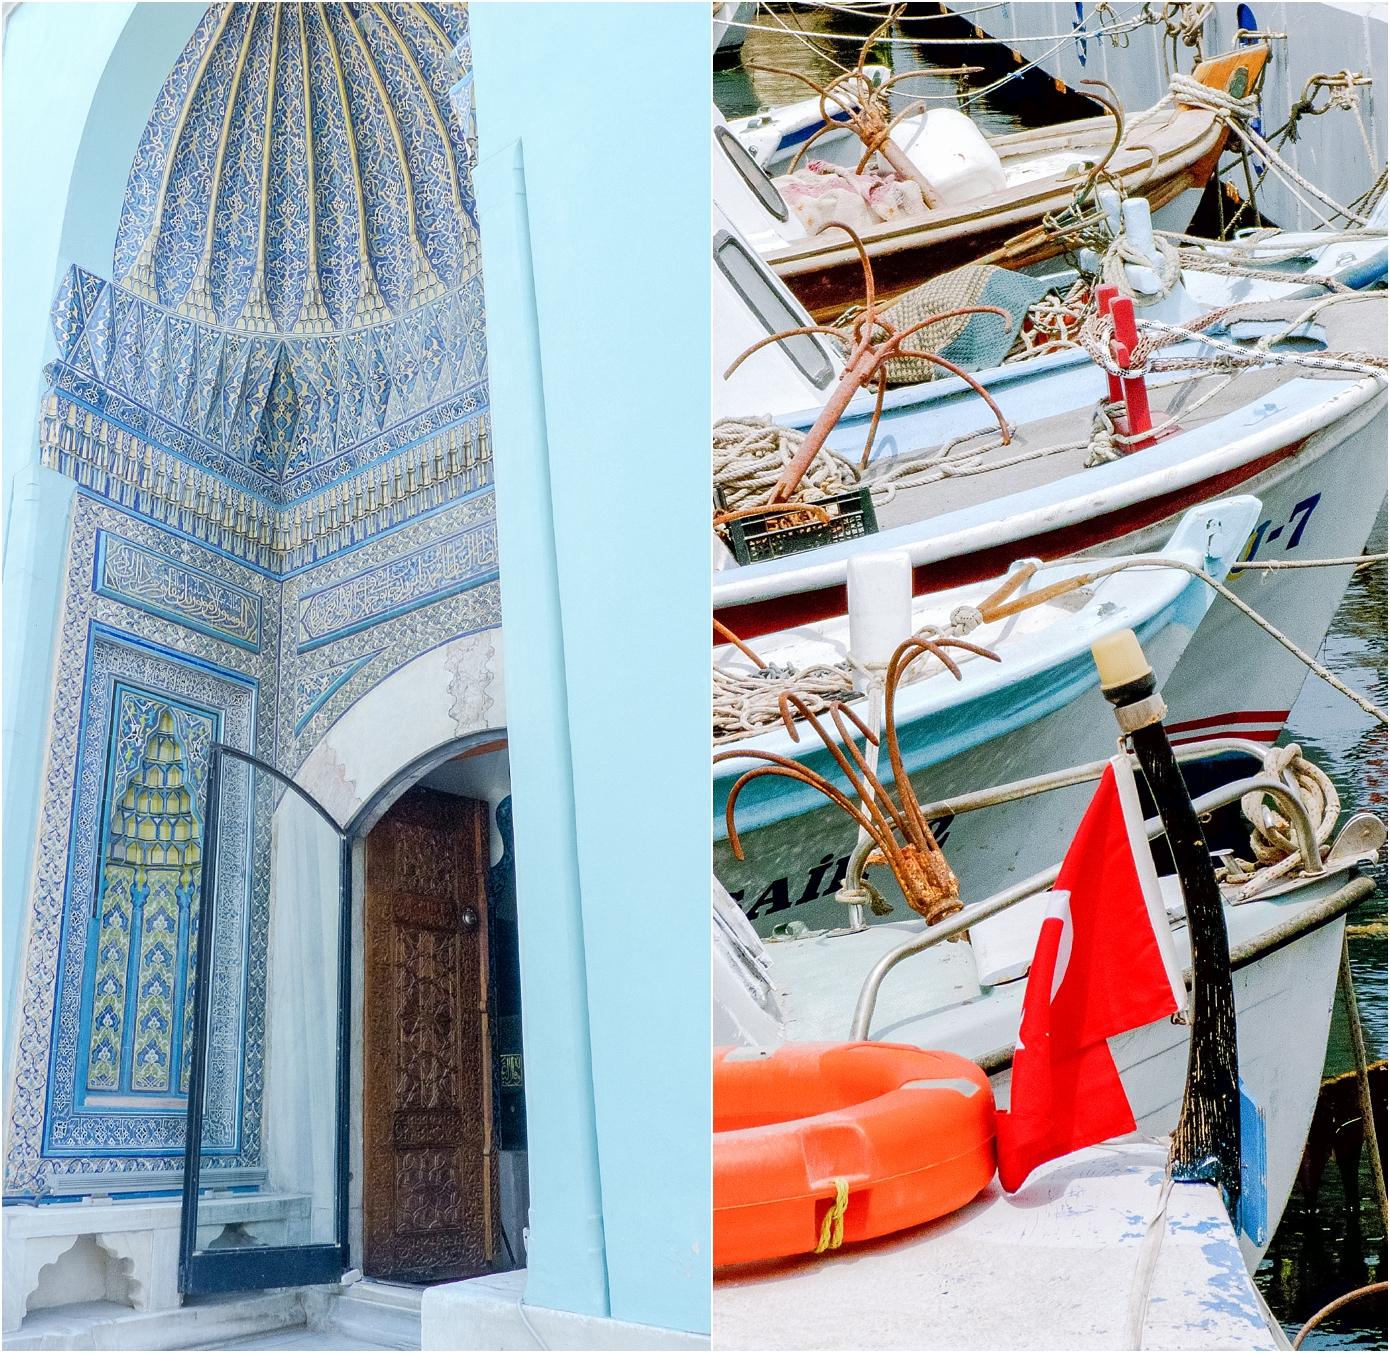 santorini-greece-wedding-photos-in-oia-destination-wedding-photographer-by-courtney-carolyn-photography_0002.jpg